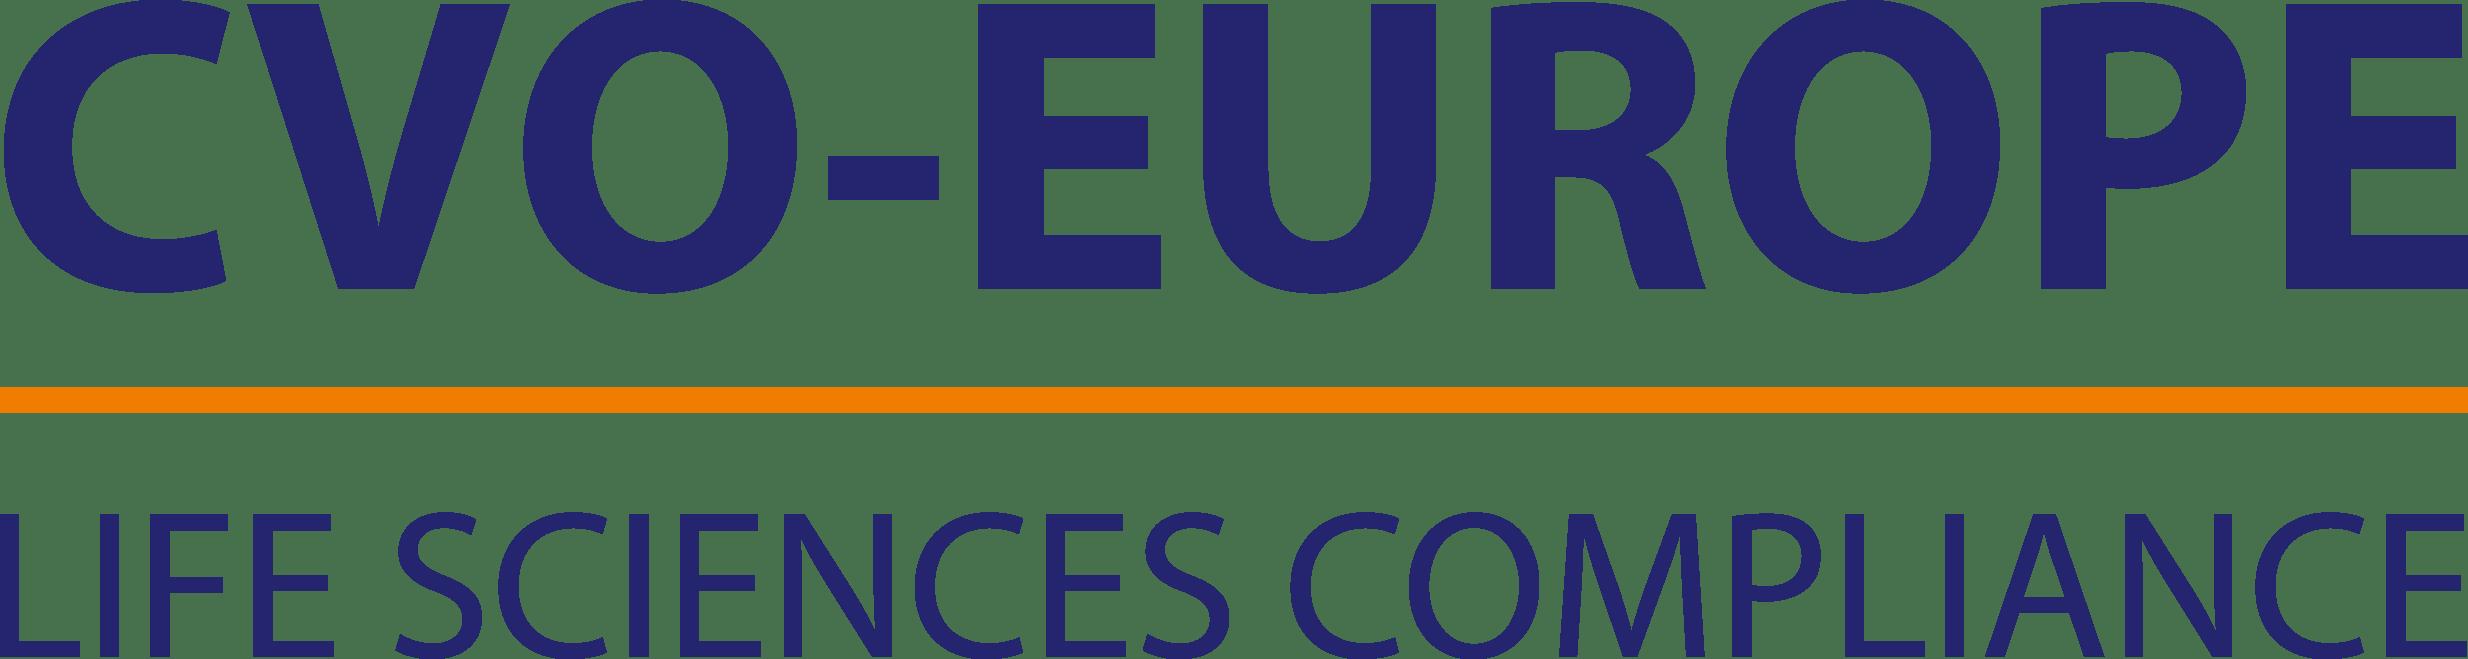 CVO EUROPE